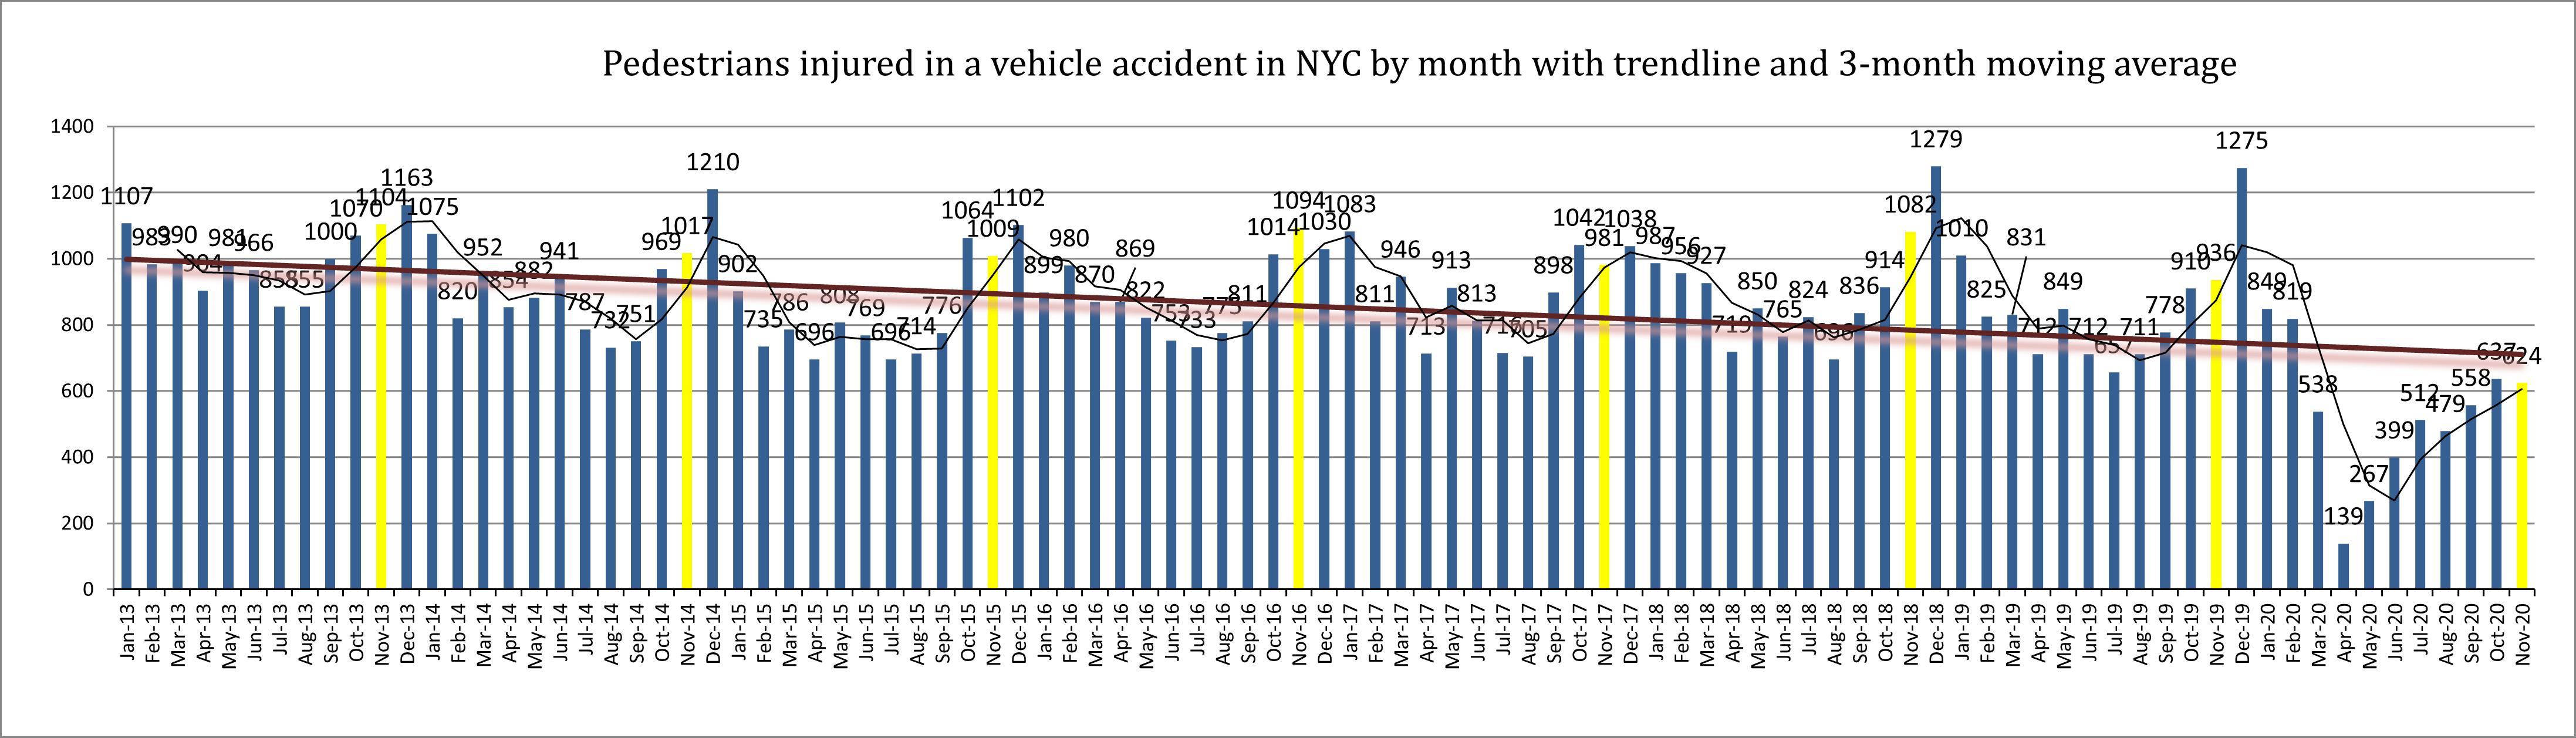 ew York pedestrian accident injuries November 20